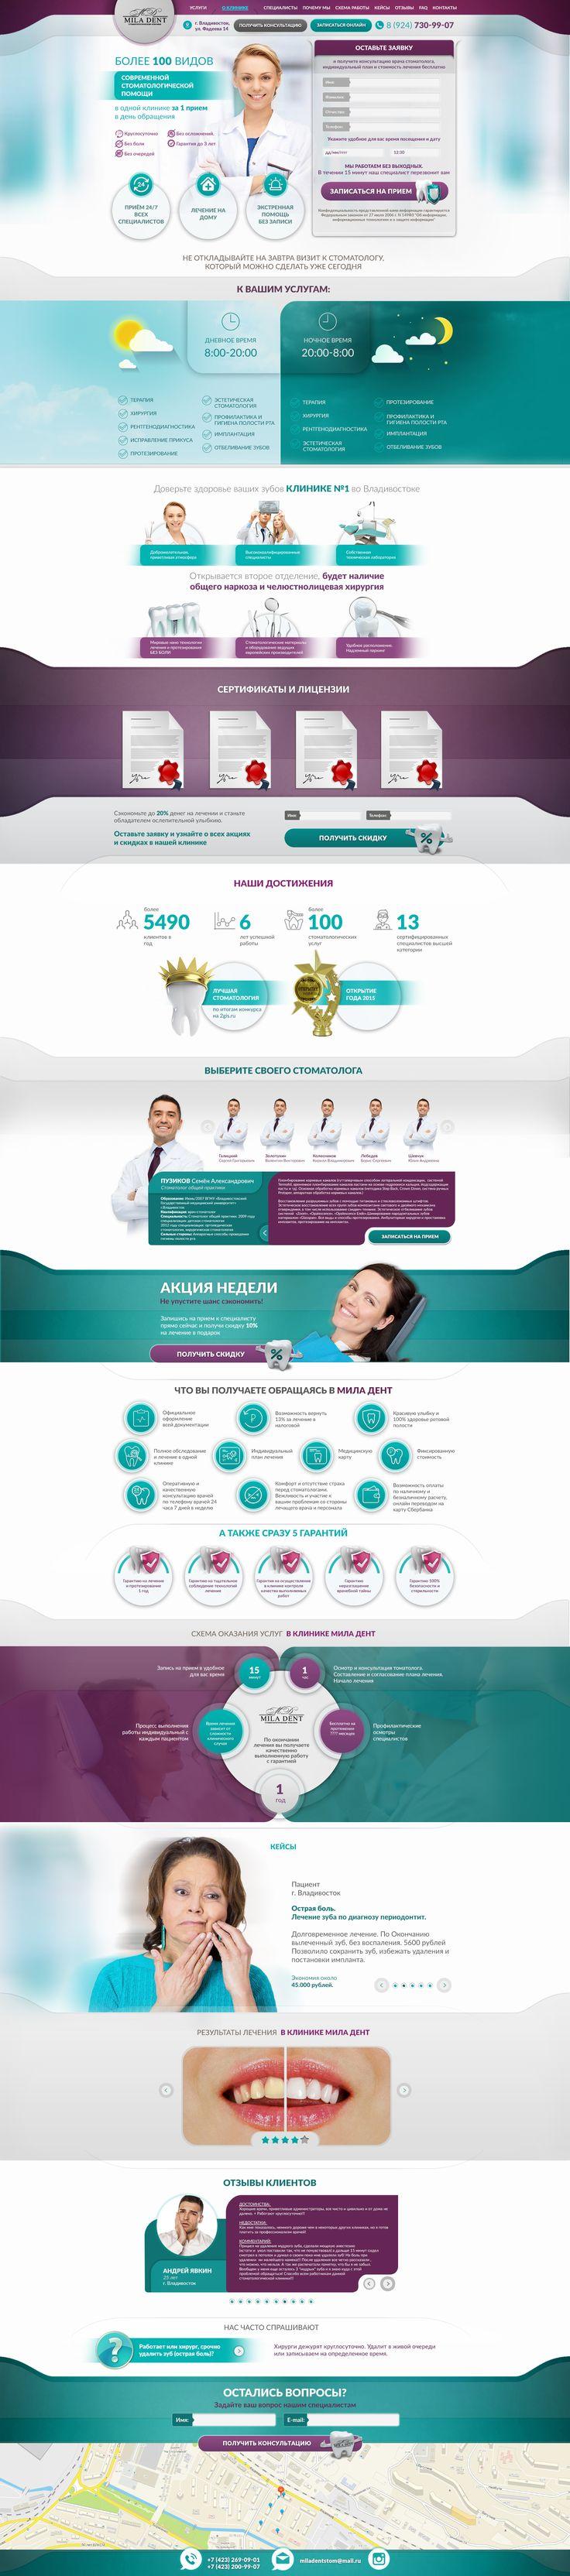 MILA DENT dental clinic #landing, #page, #design, #web, #HTML5, #photoshop, #website, #medical, #dental, #clinic